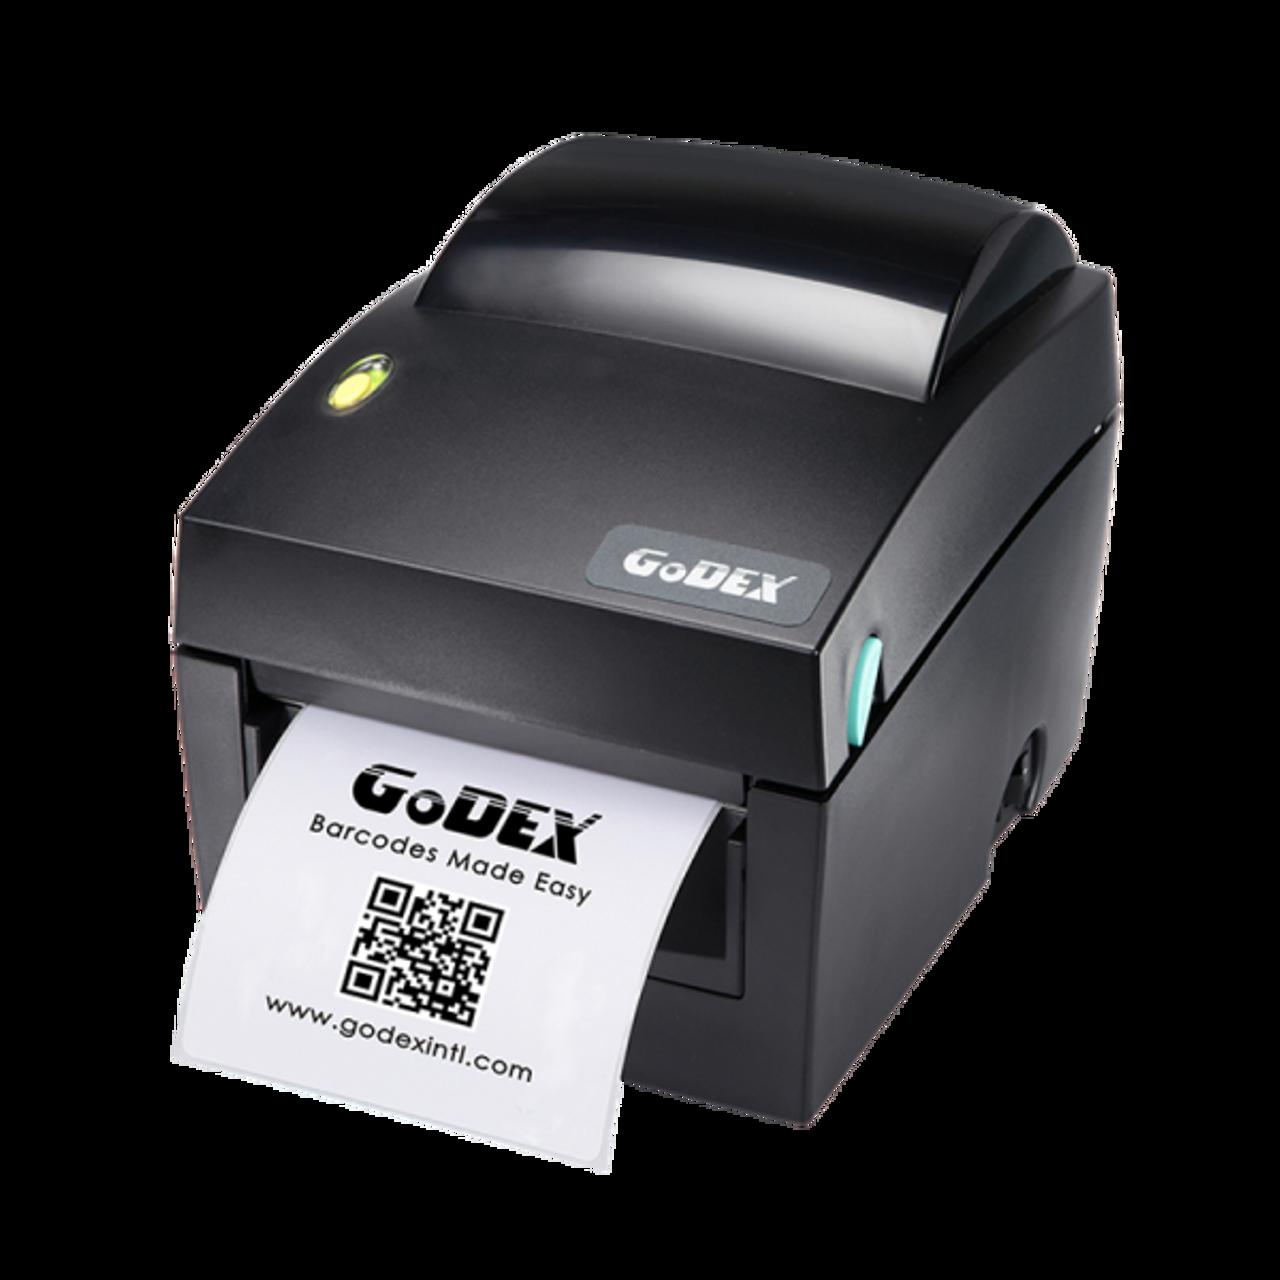 "Godex DT4x 4"" Direct Thermal Barcode Label Machine, 203 dpi, 7 ips"